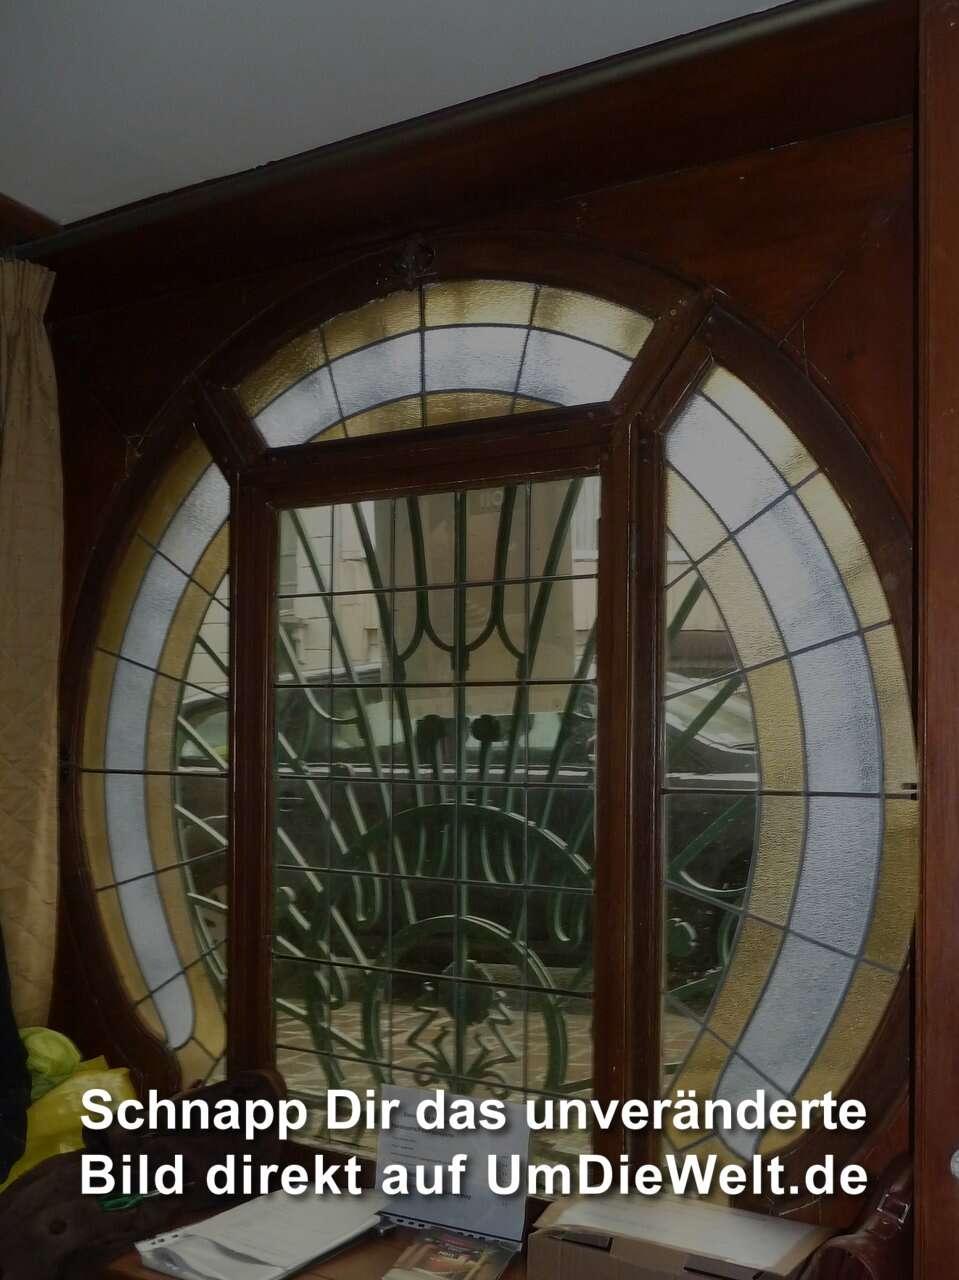 Belgien reisebericht eine reihe privath user for Art nouveau interieur